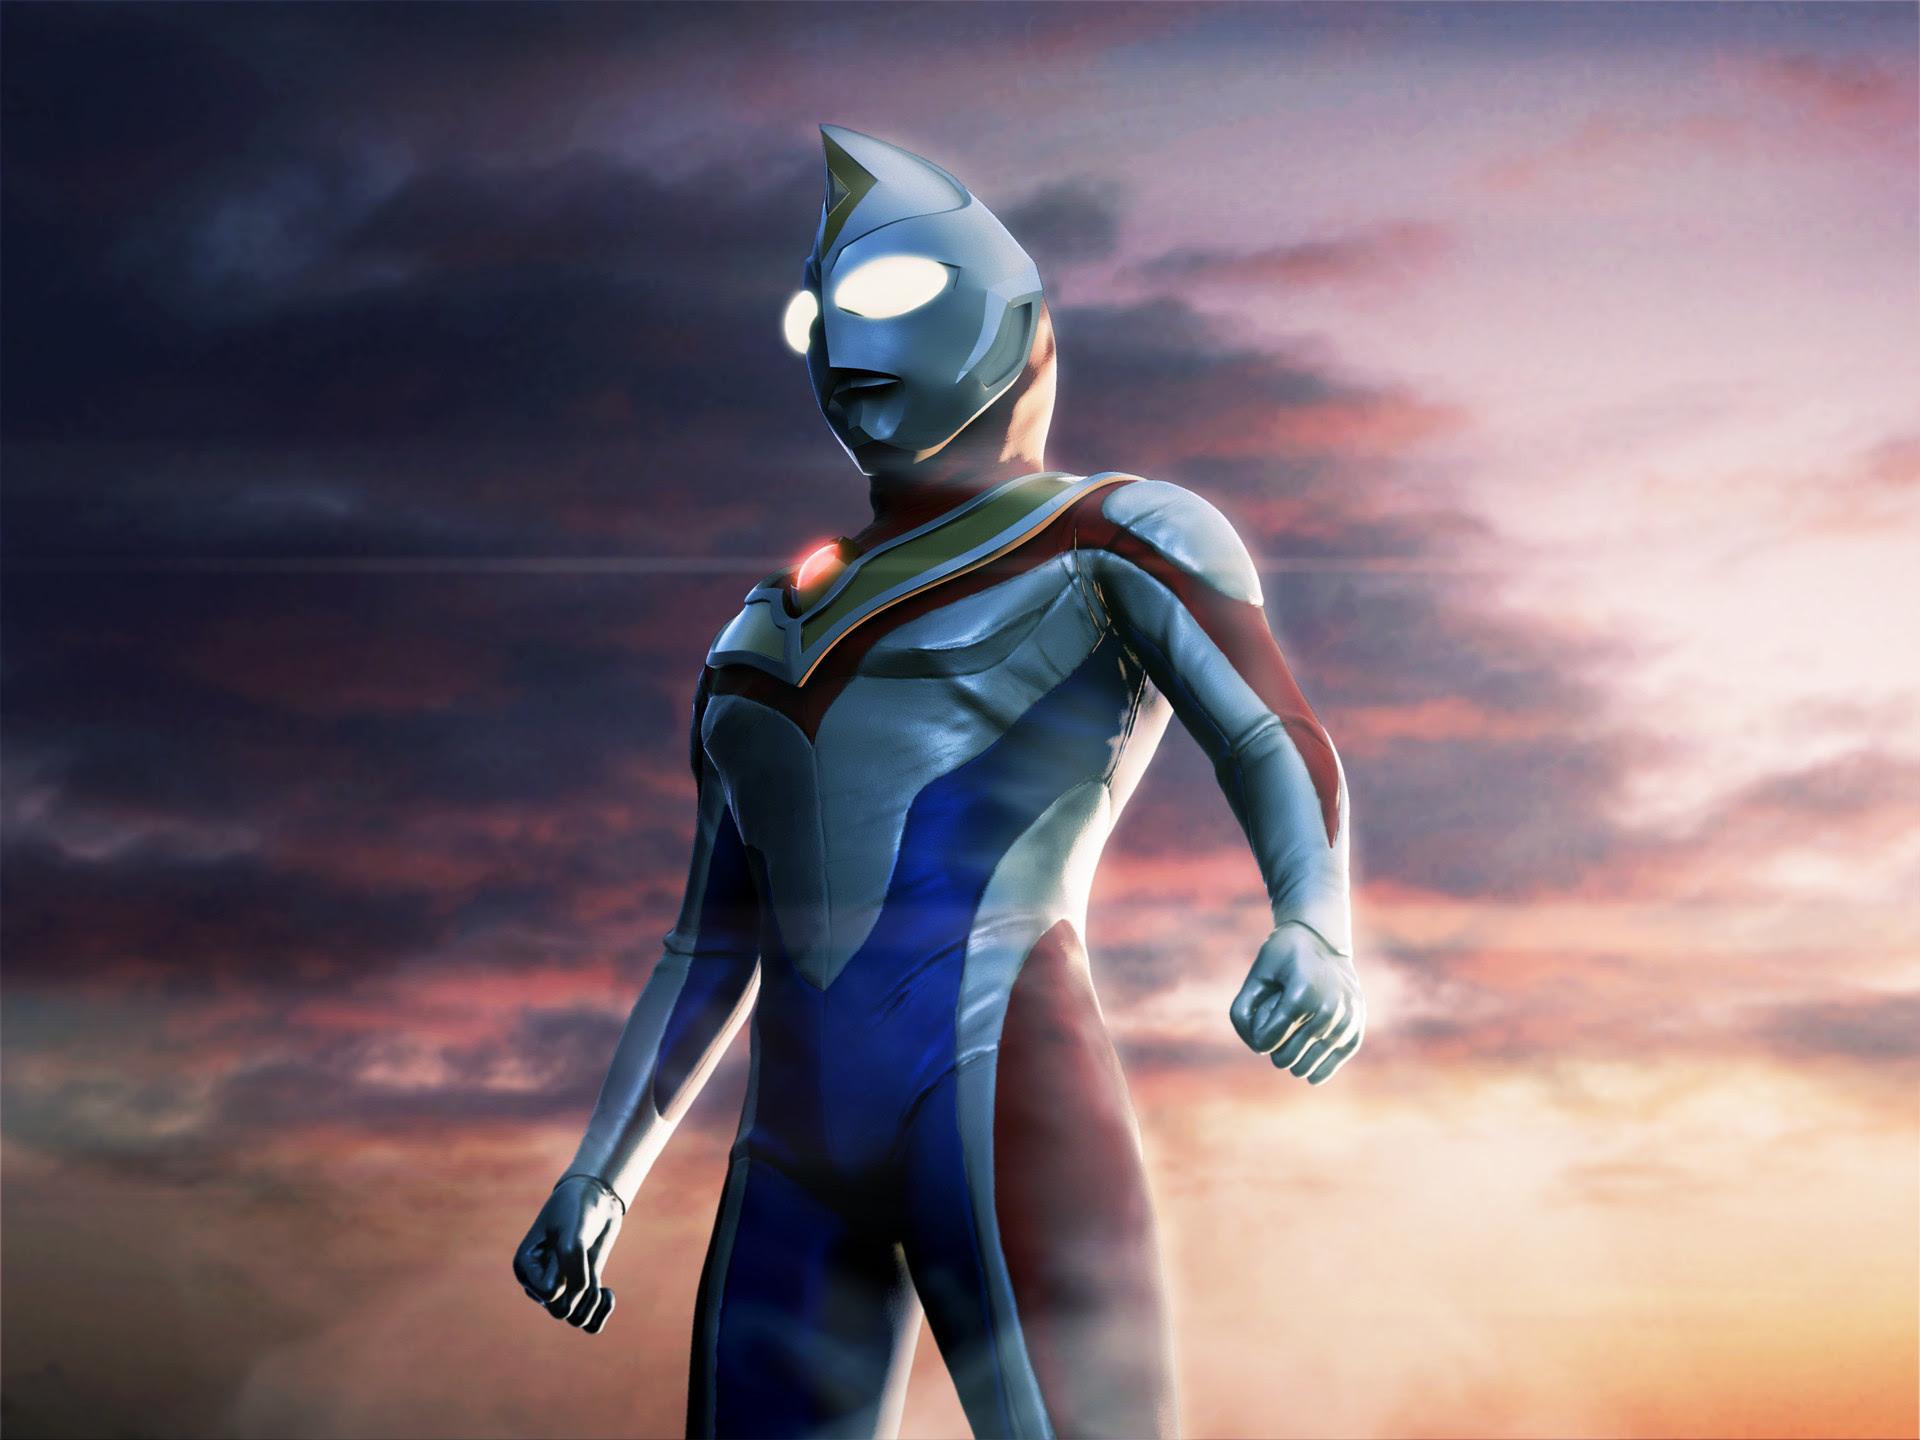 Baru 30++ Gambar Gambar Kartun Ultraman - Kumpulan Gambar ...